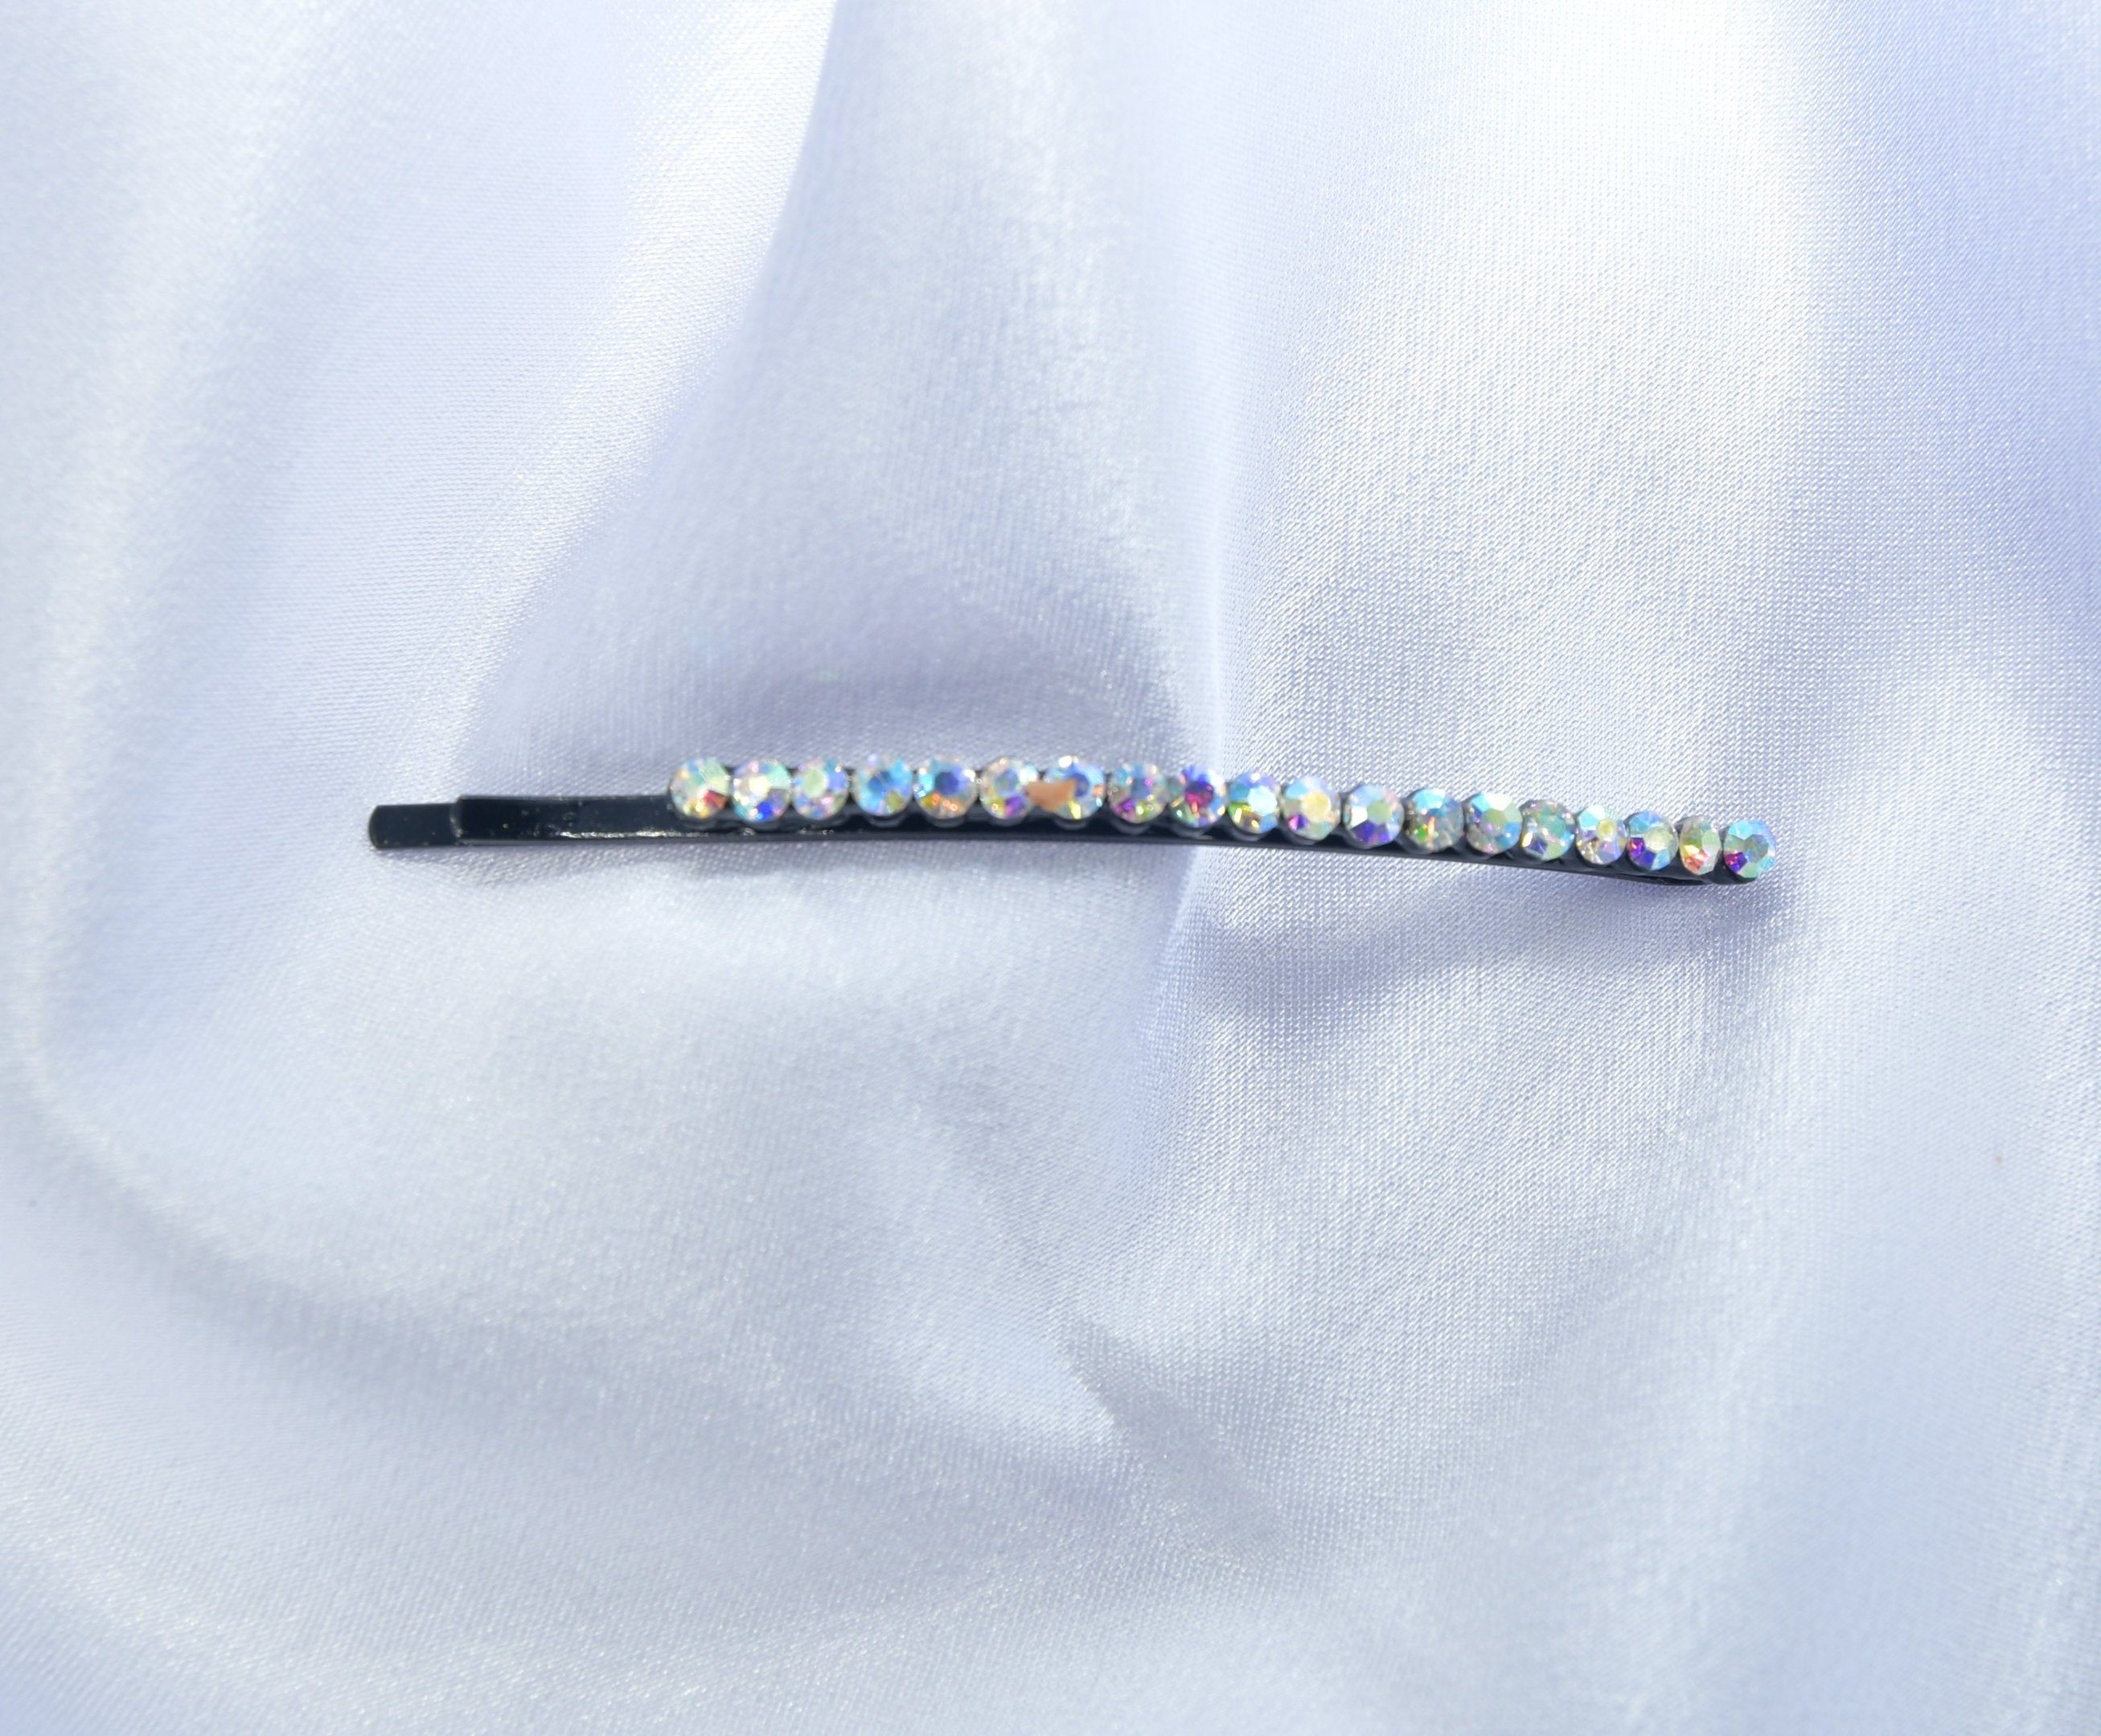 repurposed jewelry Black Onyx hair pin Black rhinestone hair pin jeweled hair pin hair accessories rhinestone hair pin